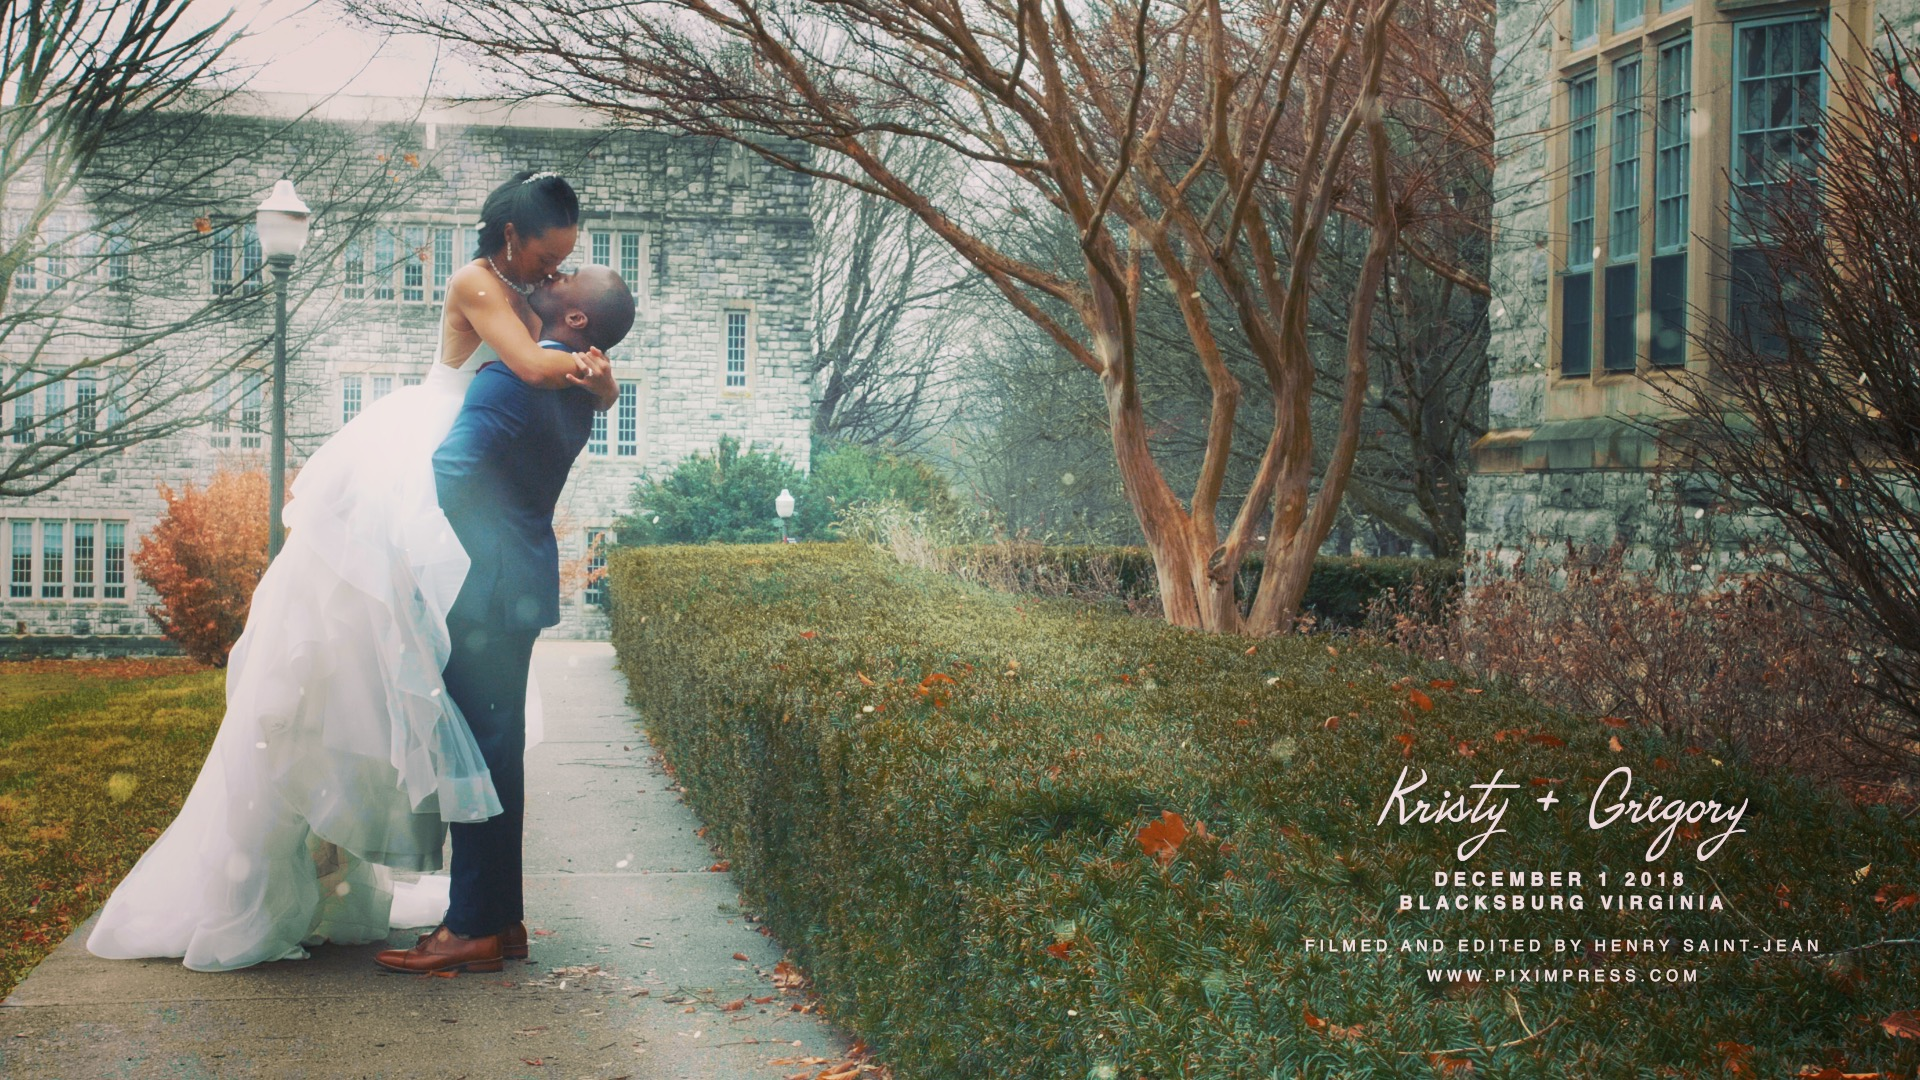 Kristy + Gregory | Blacksburg, Virginia | Owens Banquet